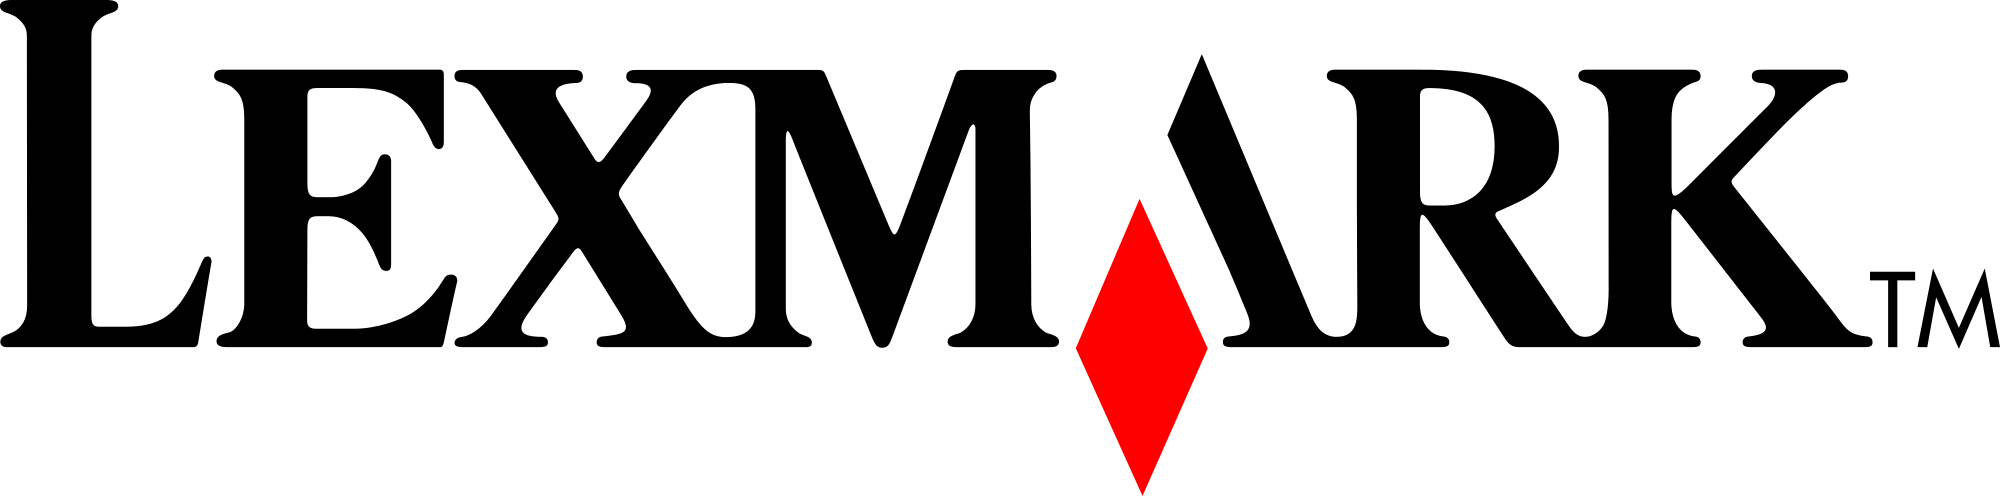 Lexmark Logo PNG - 28574